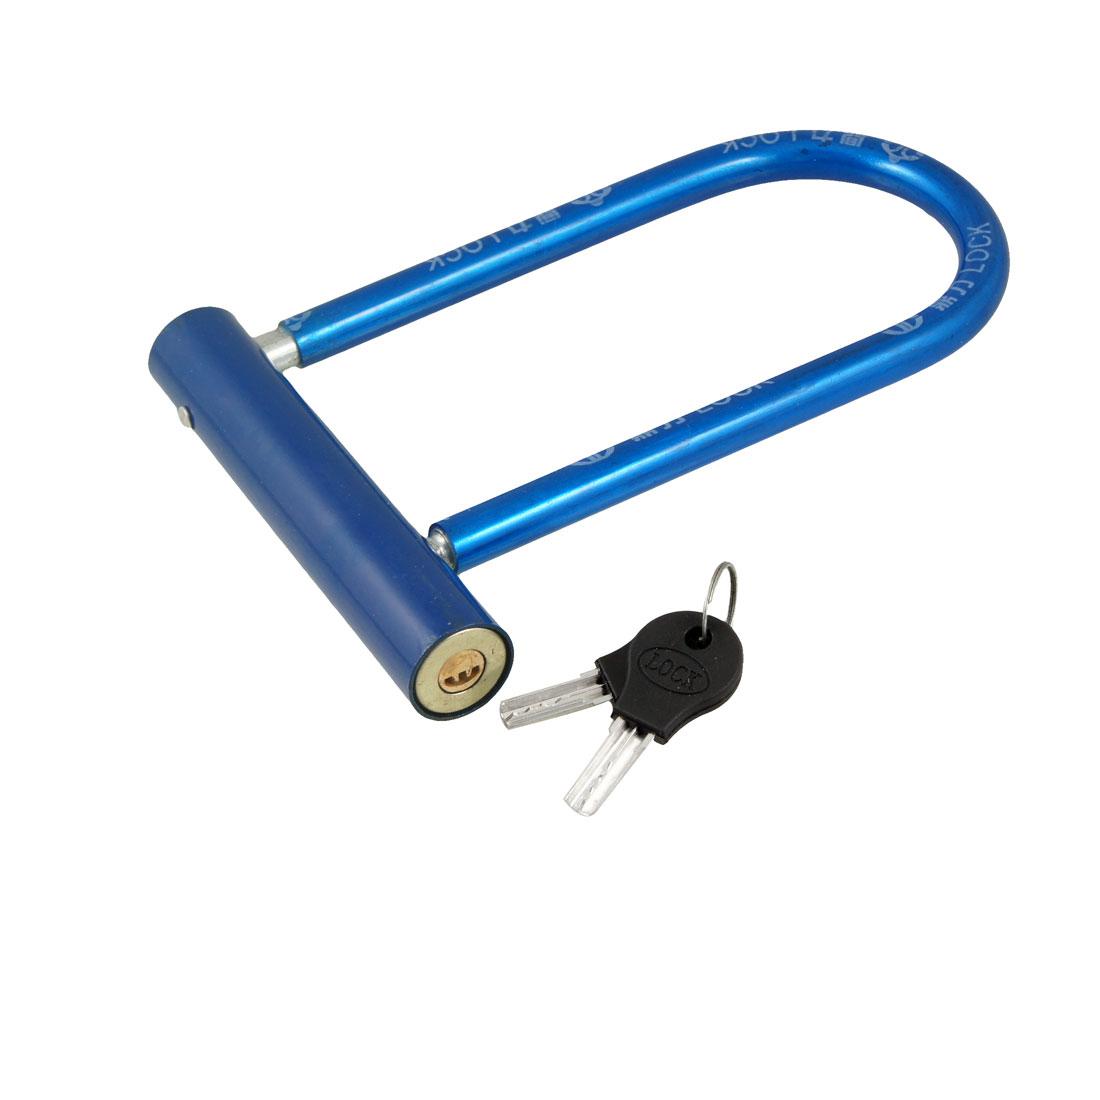 "Motorbike Motorcycle Blue Plastic Cover Safeguard U Shape Lock 7.7"" w Keys"